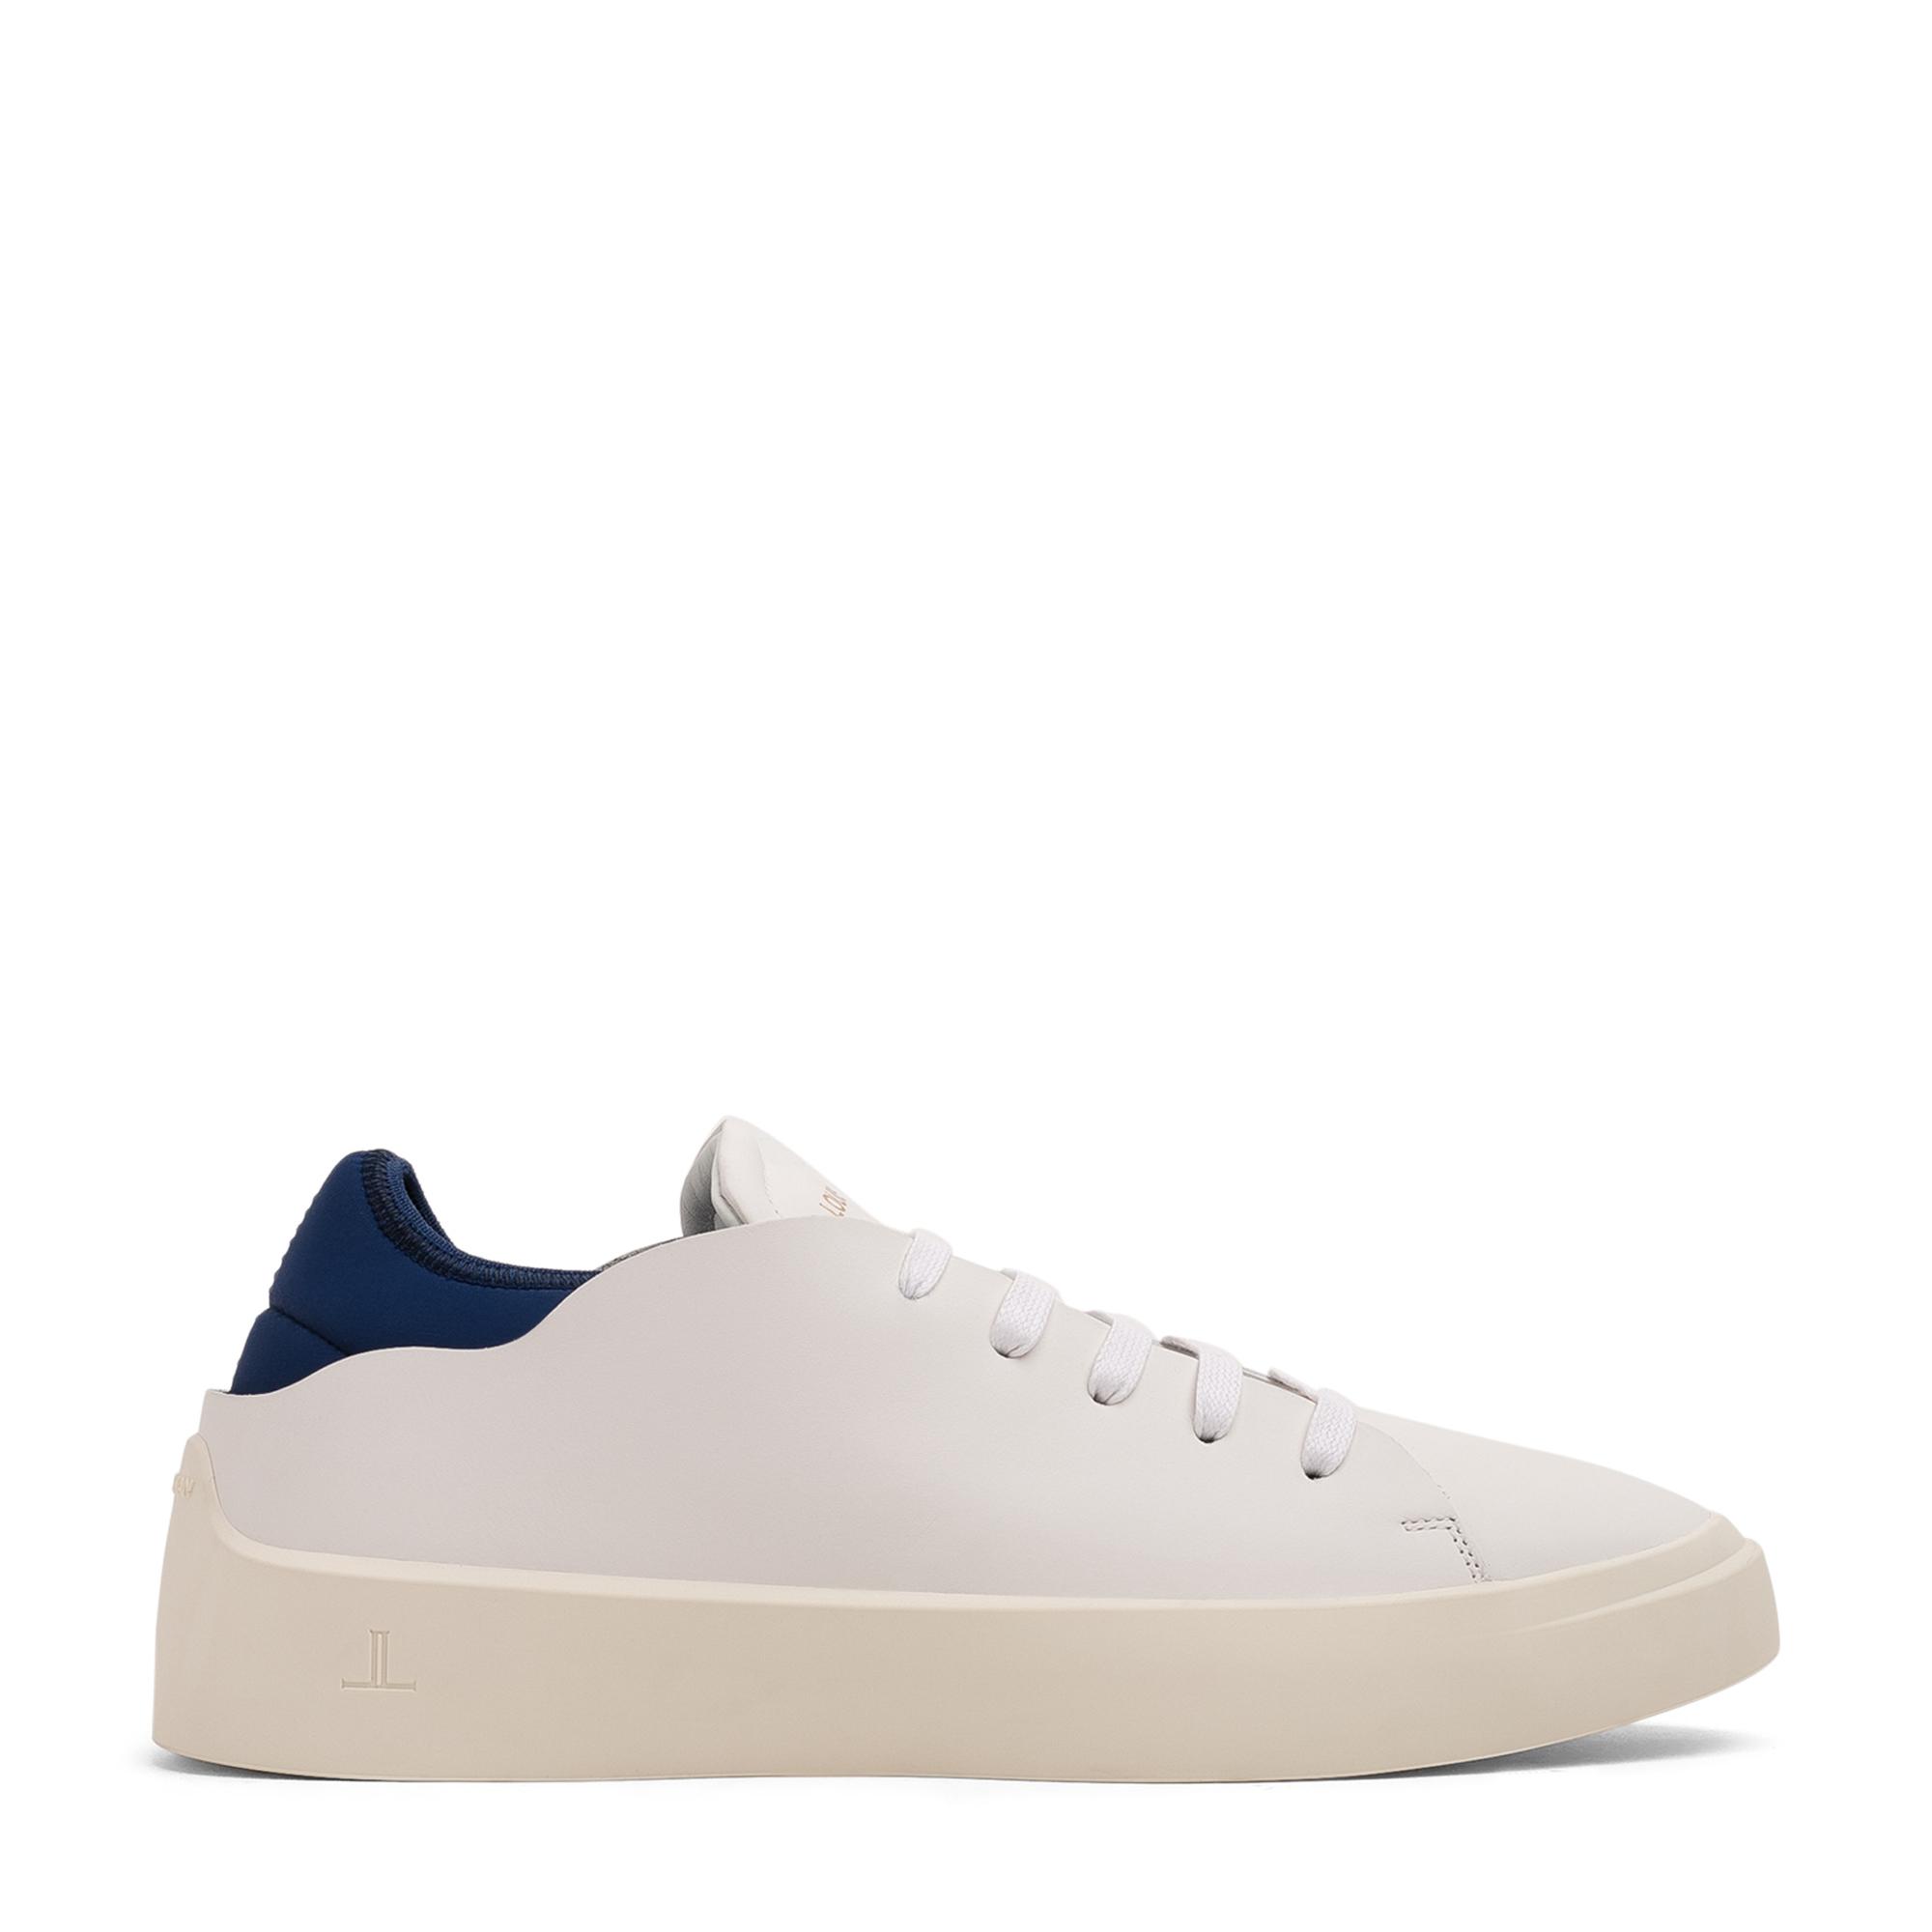 Bel Air sneakers